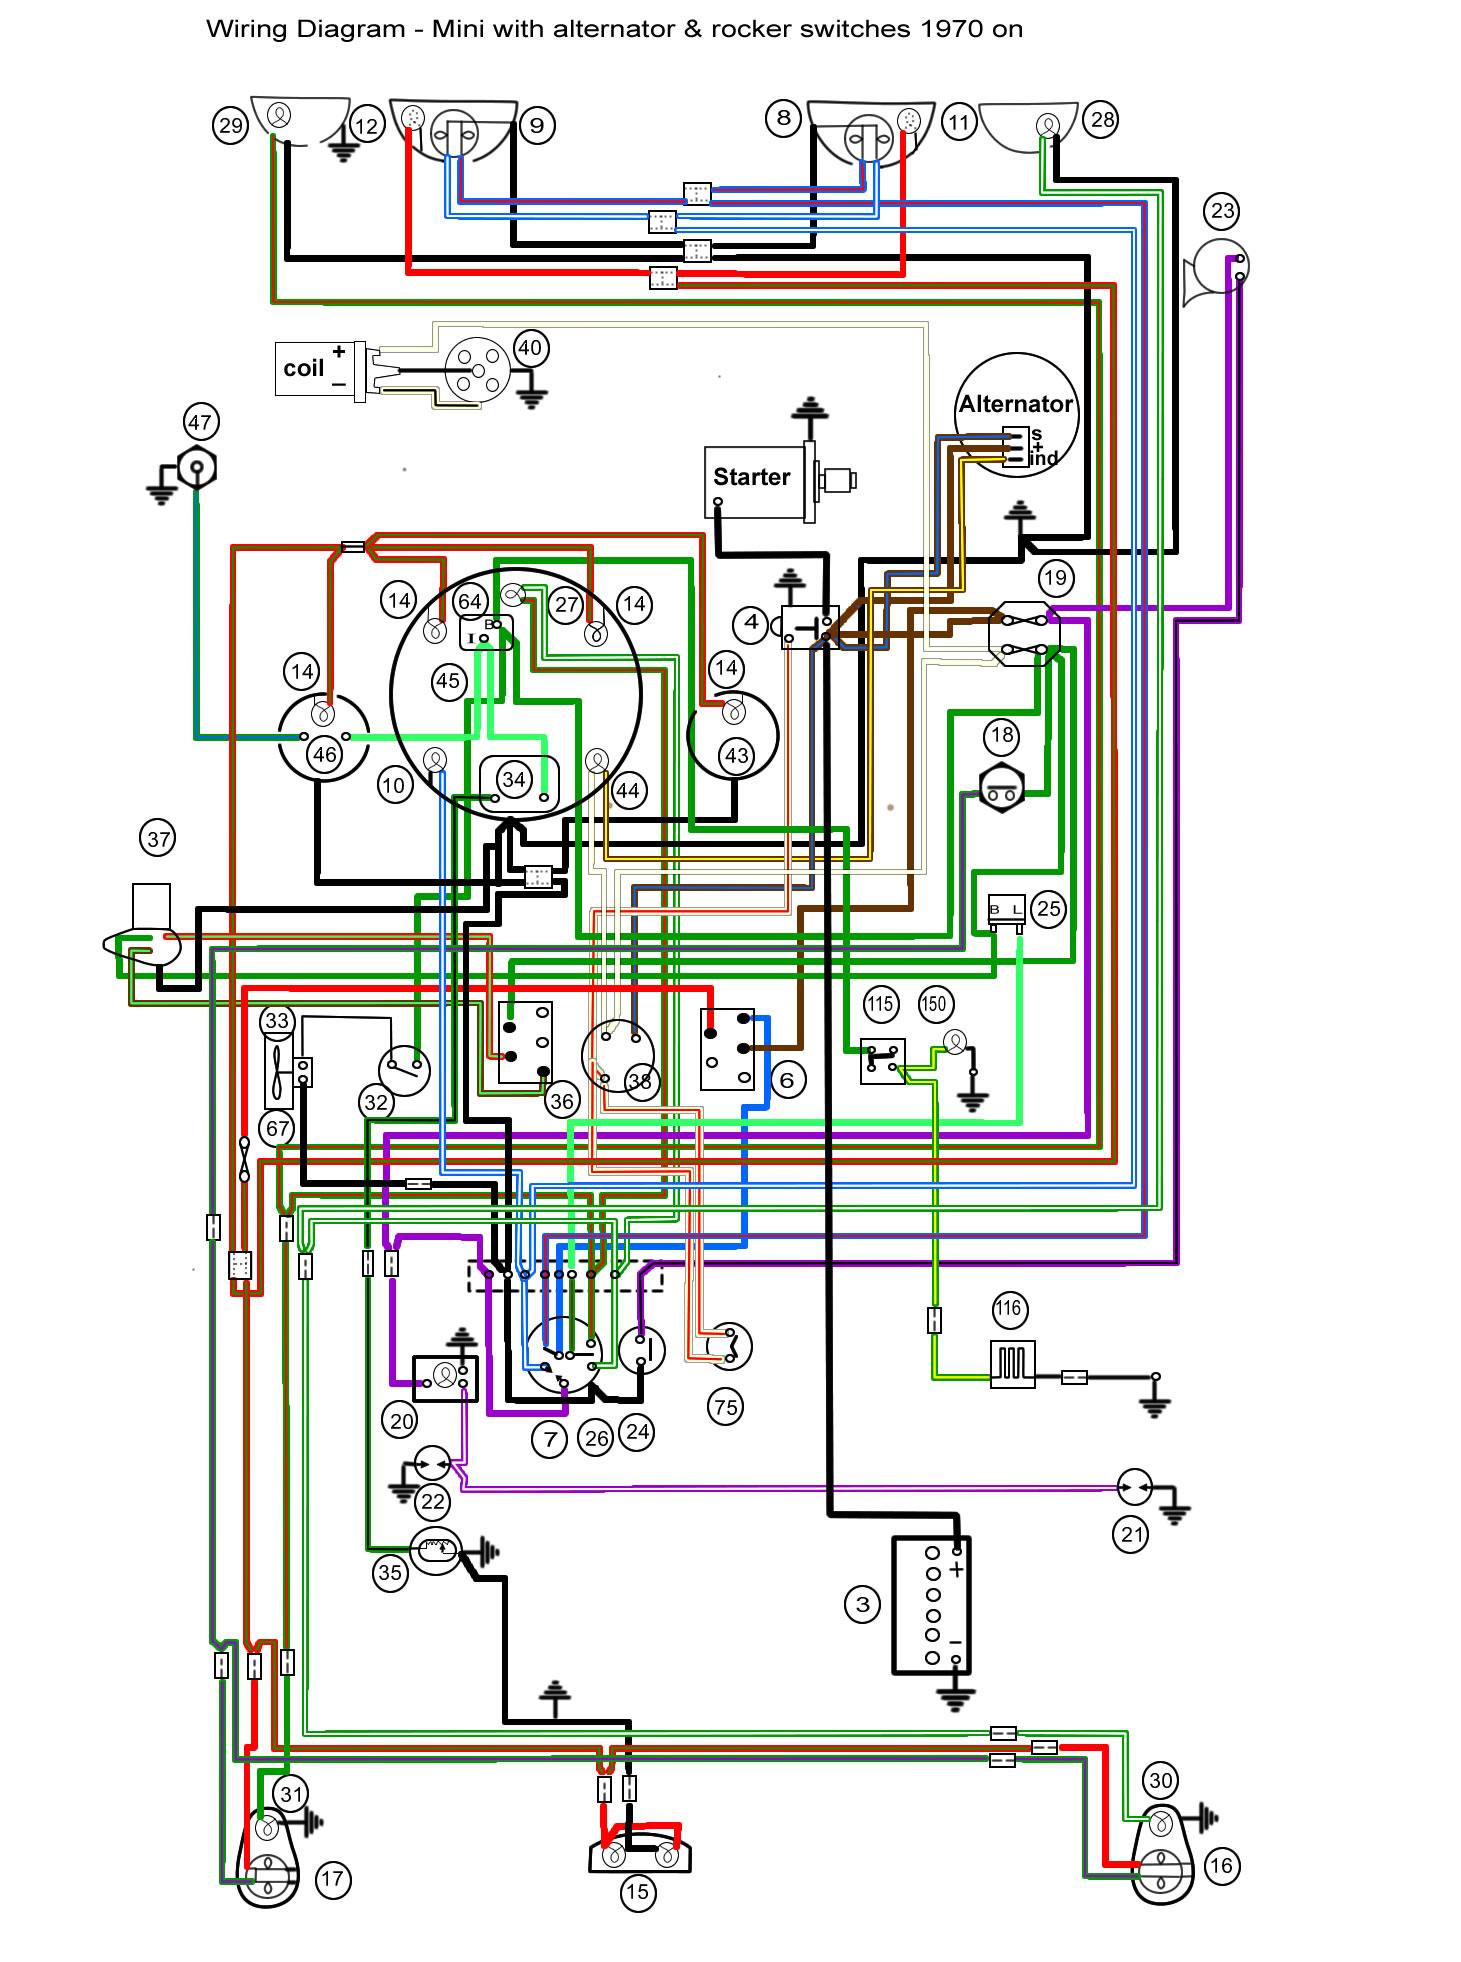 [SCHEMATICS_48IS]  Triumph Spitfire Ignition Wiring Diagram - 2004 Toyota Corolla Stereo Wiring  Diagram for Wiring Diagram Schematics | Triumph Spitfire Ignition Wiring Diagram |  | Wiring Diagram Schematics